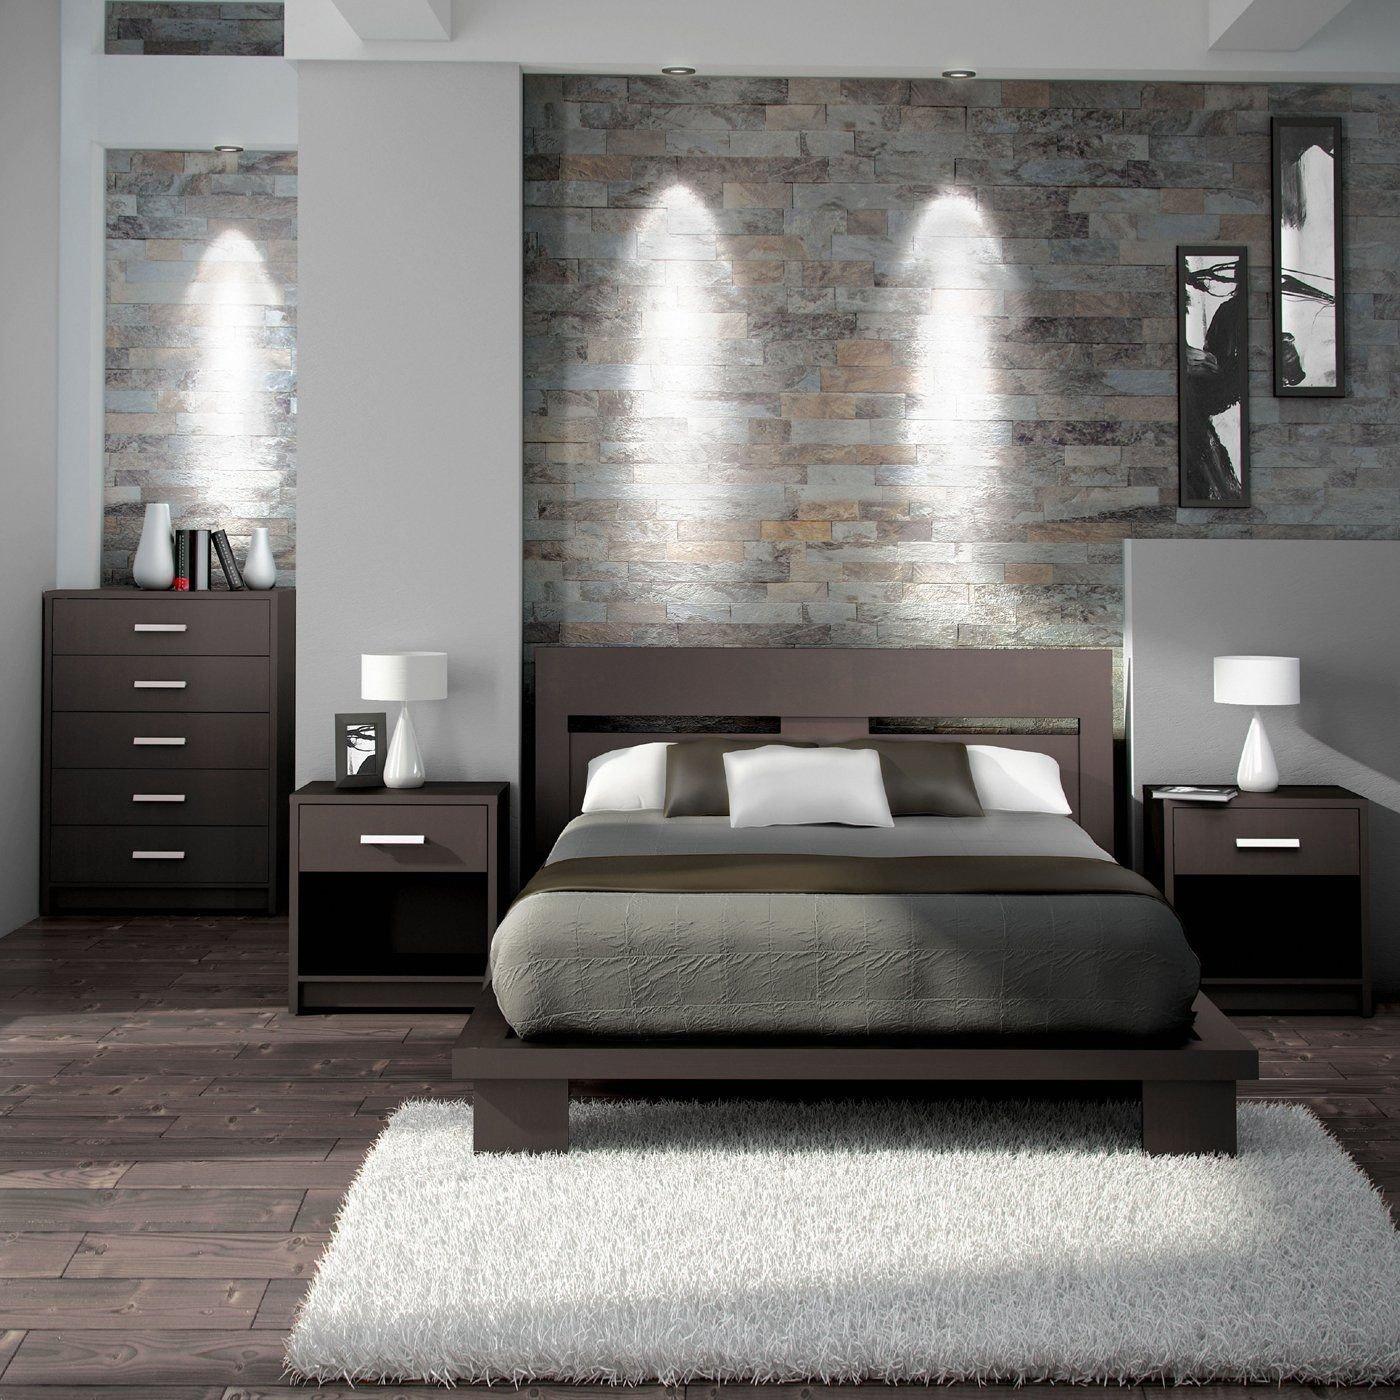 Paul Bunyan Bedroom Set New Black Bedroom Ideas Inspiration for Master Bedroom Designs